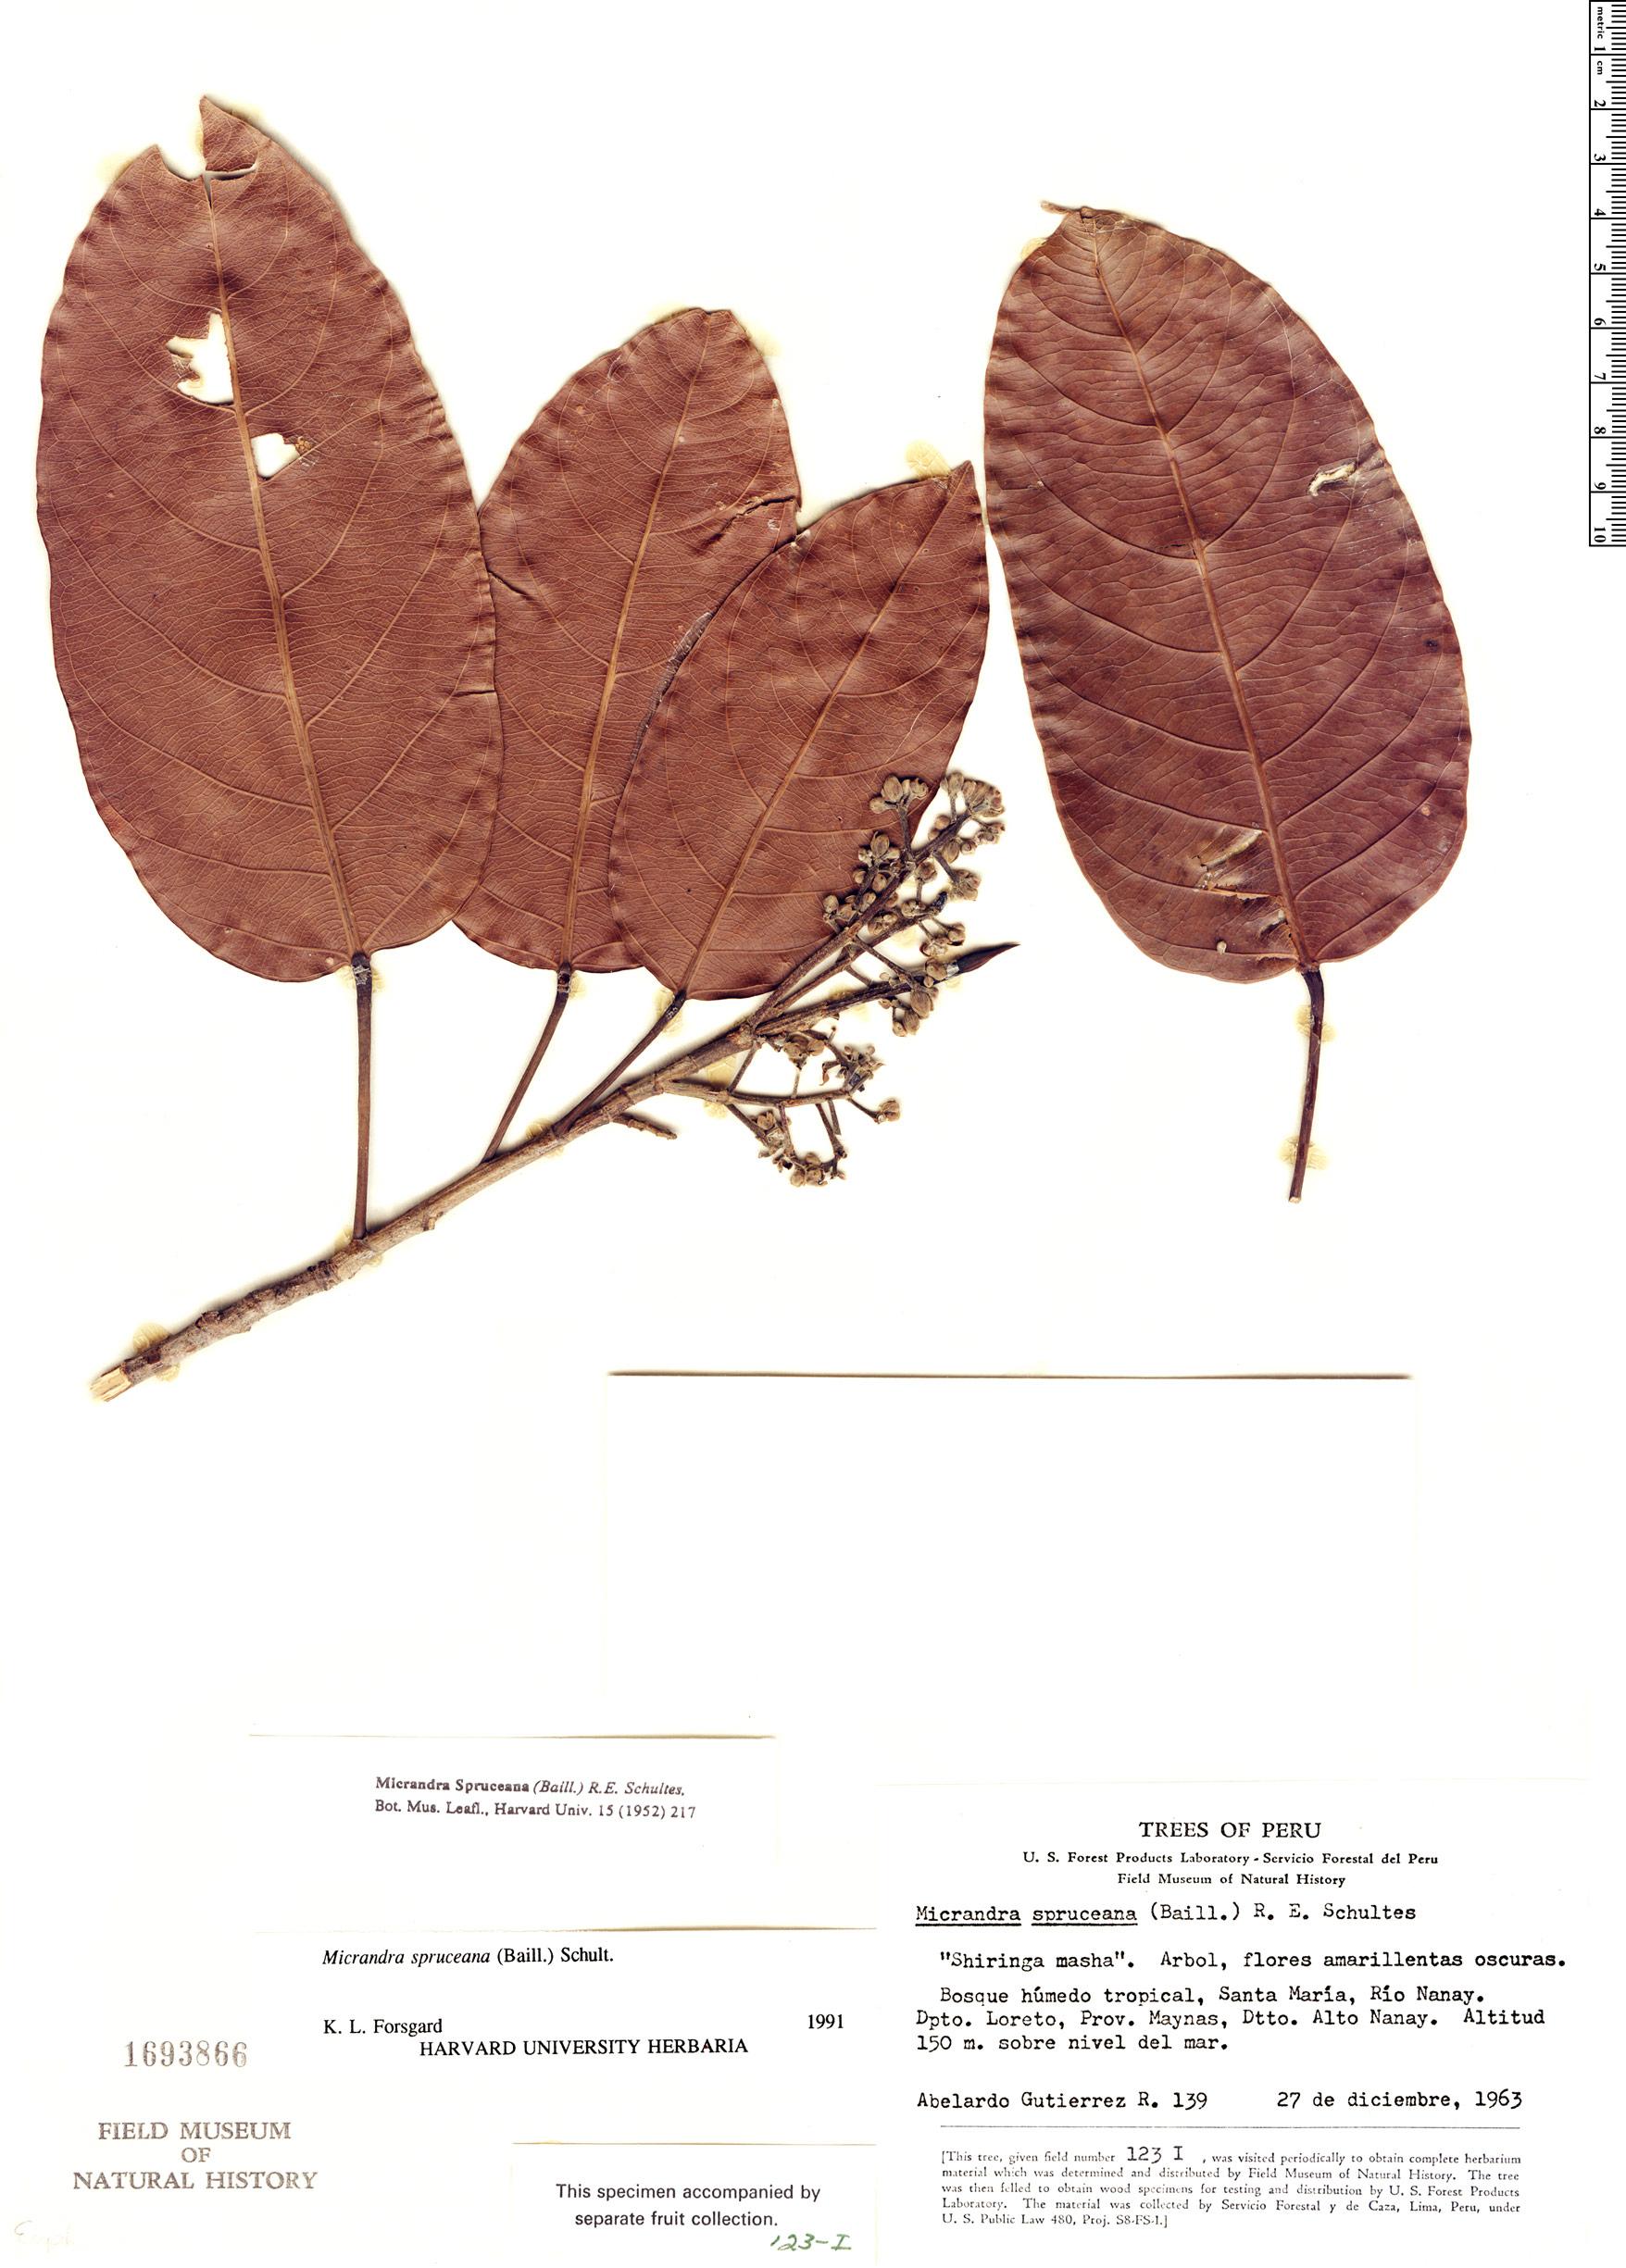 Specimen: Micrandra spruceana